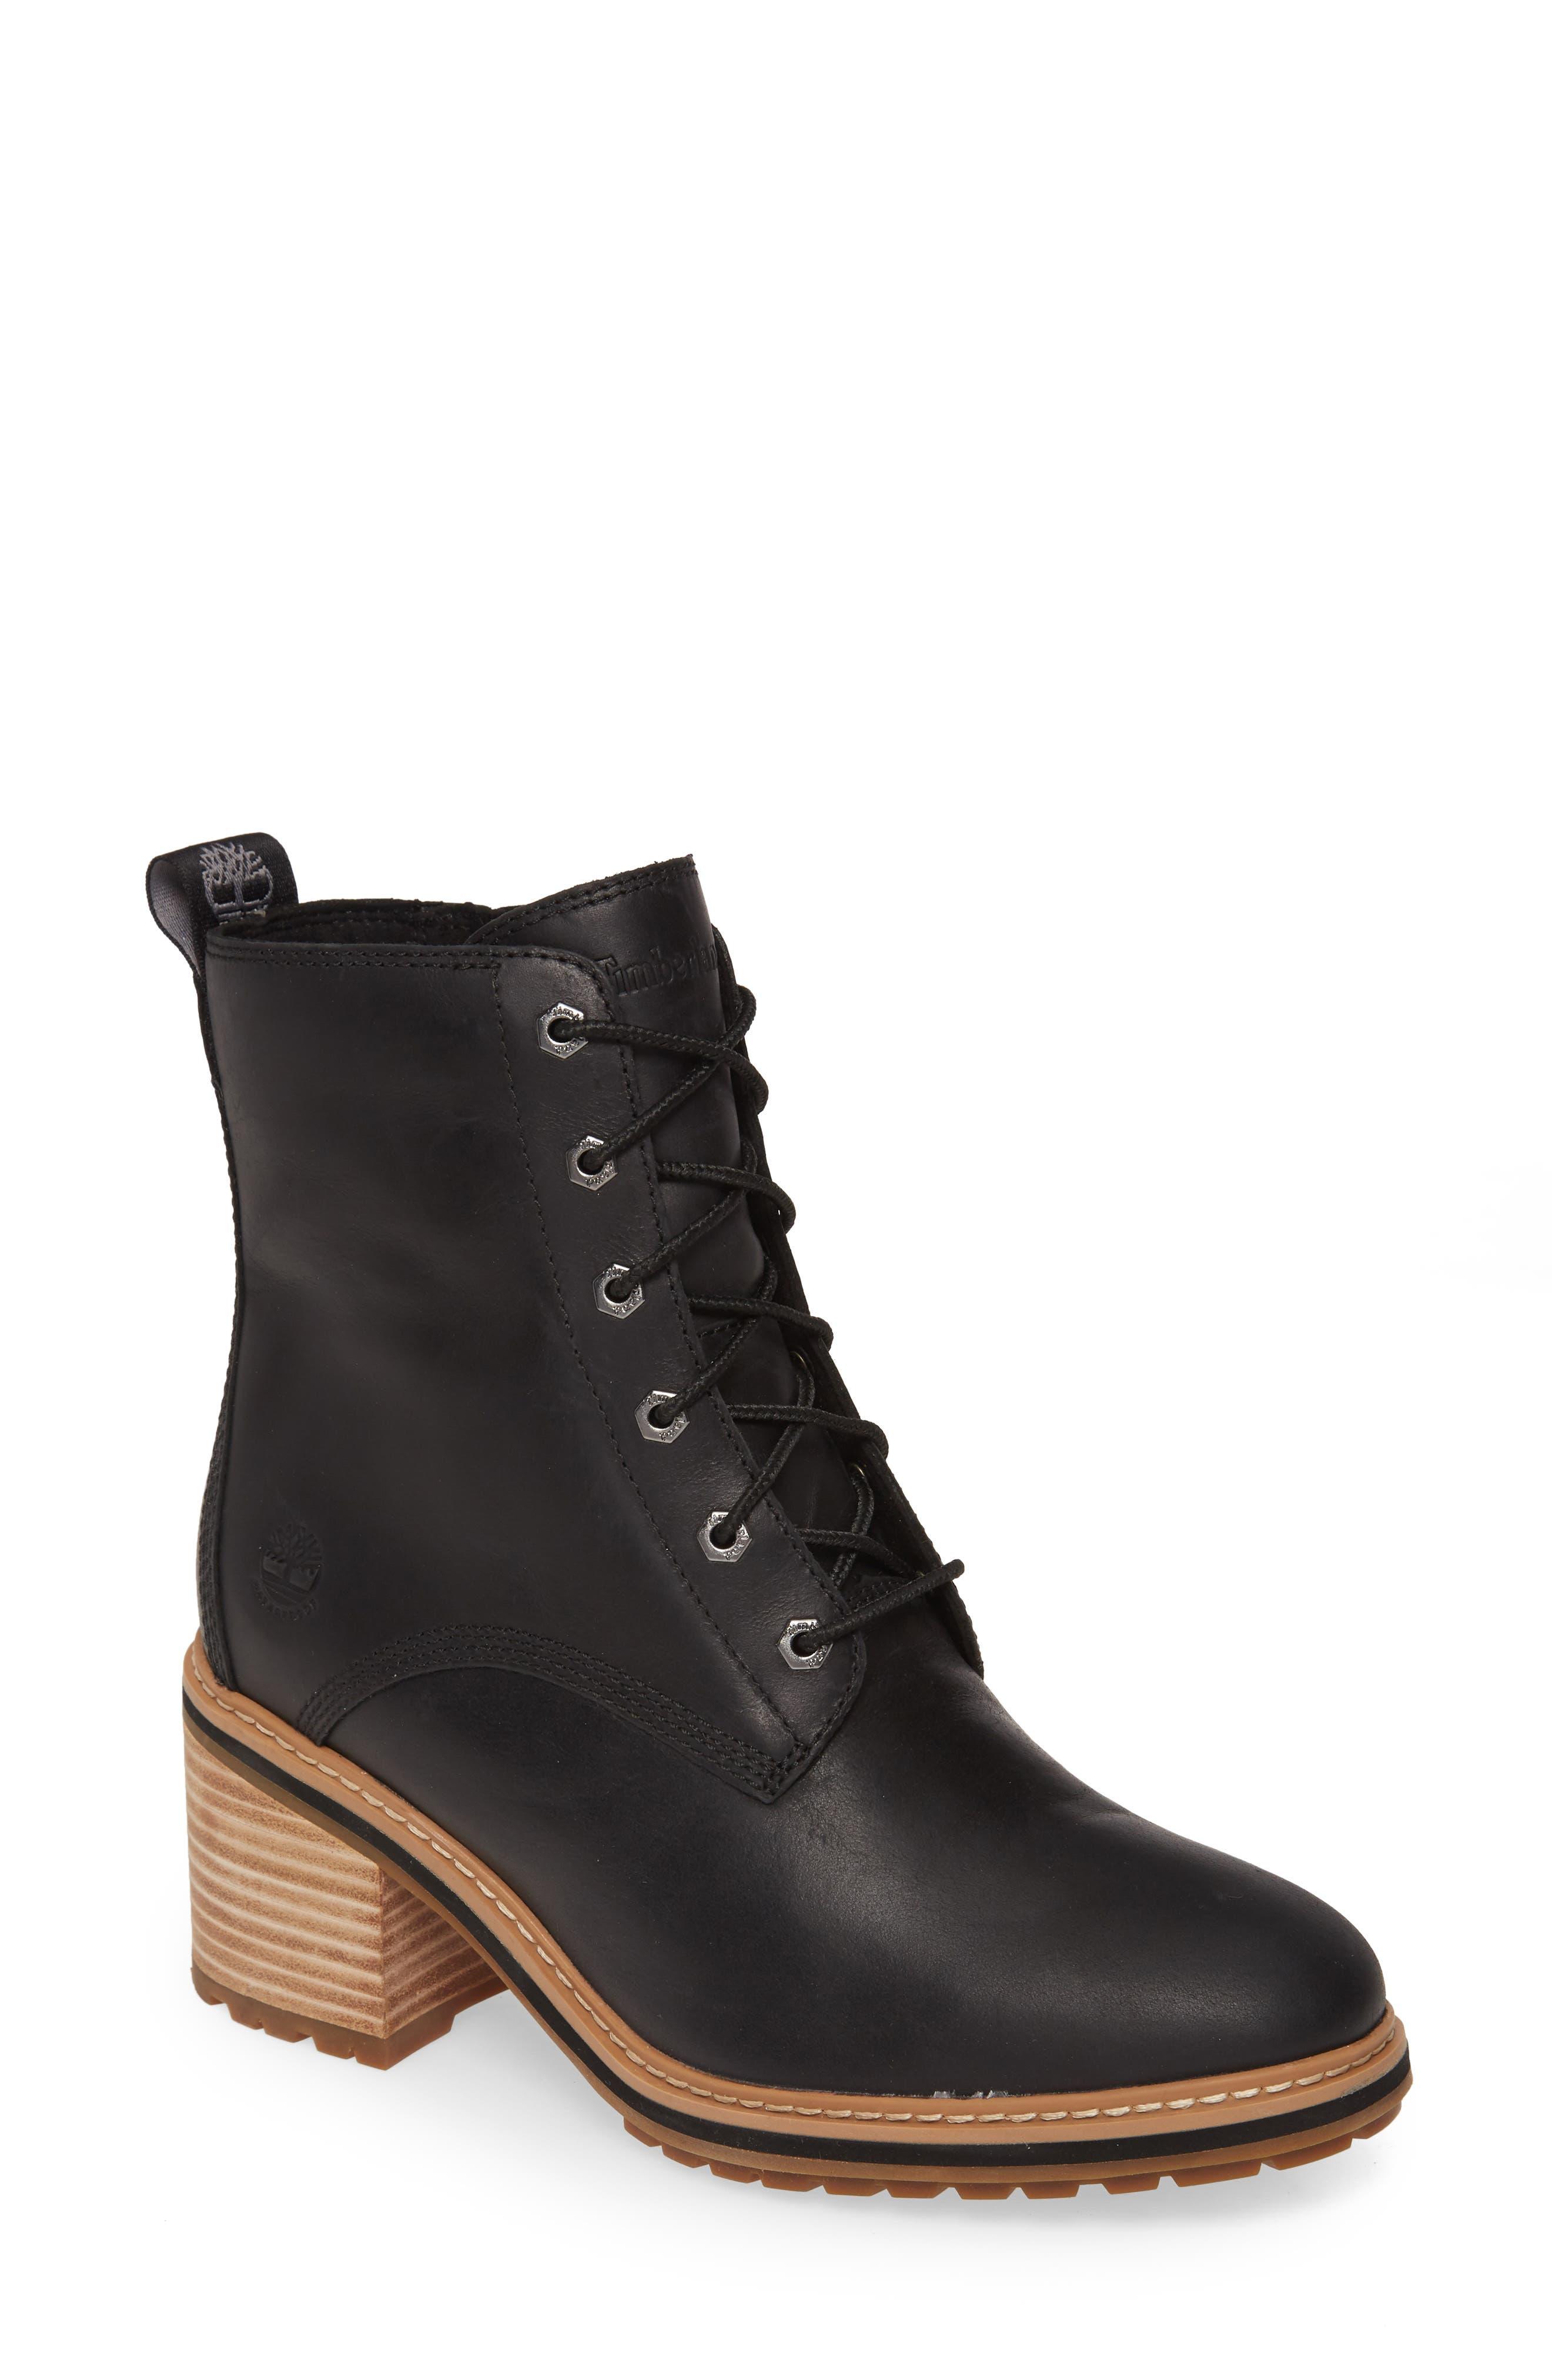 Timberland Brown Knee High Heeled BootsBooties Size US 8 Regular (M, B)